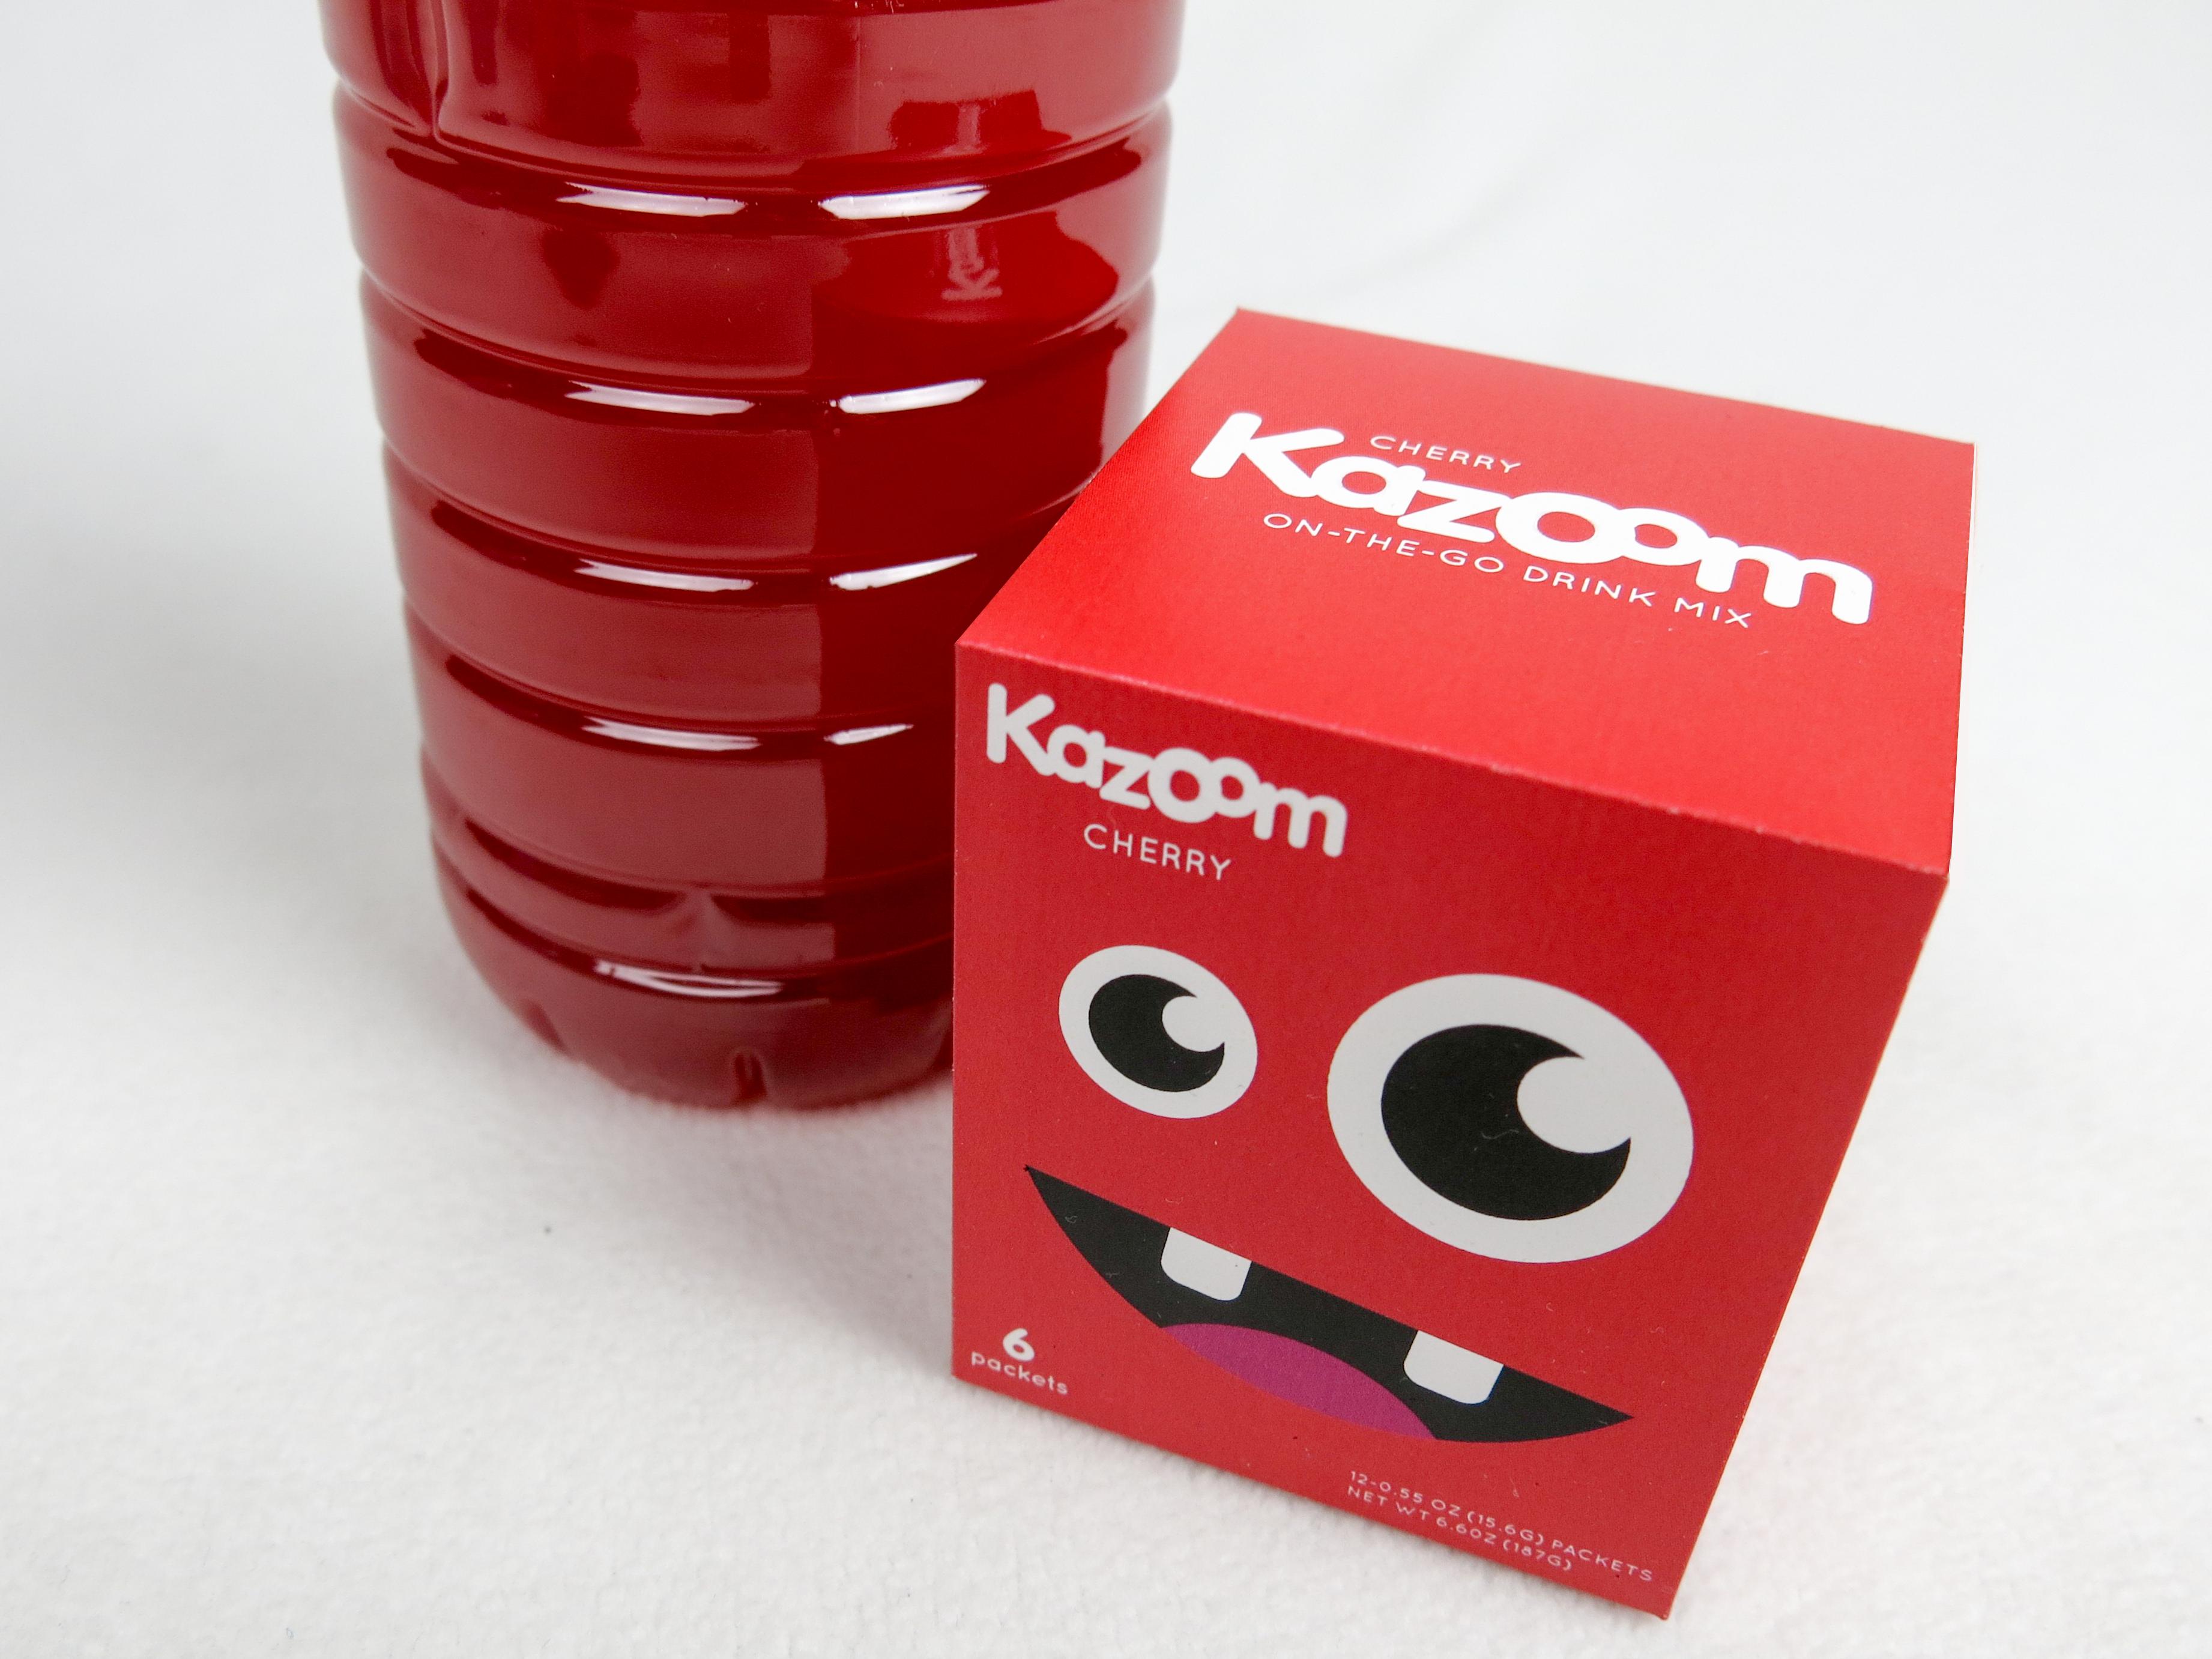 Kazoom Cherry Drink Mix